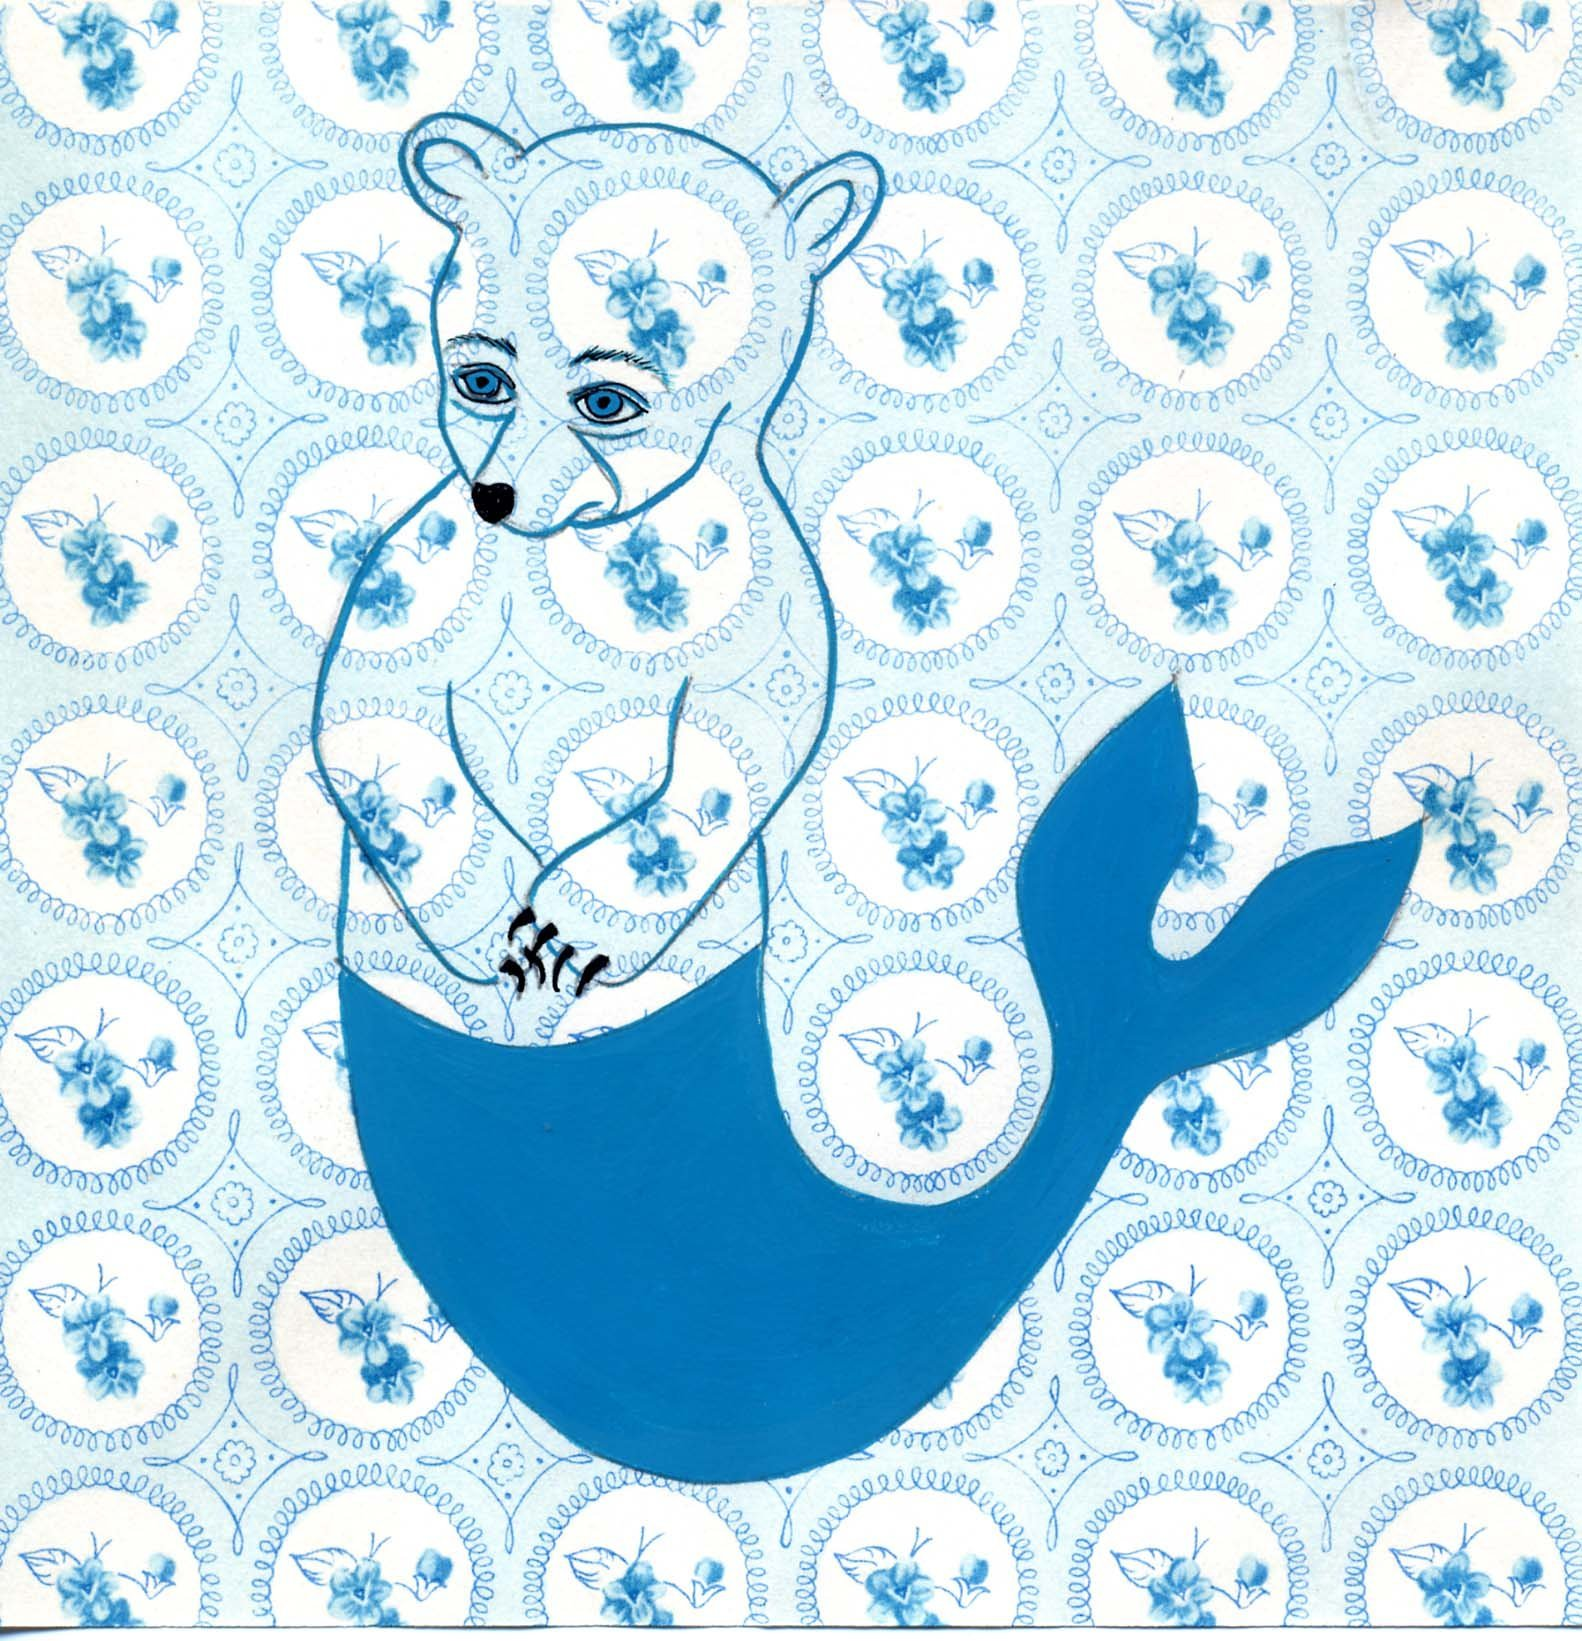 Mer-bear (2008)